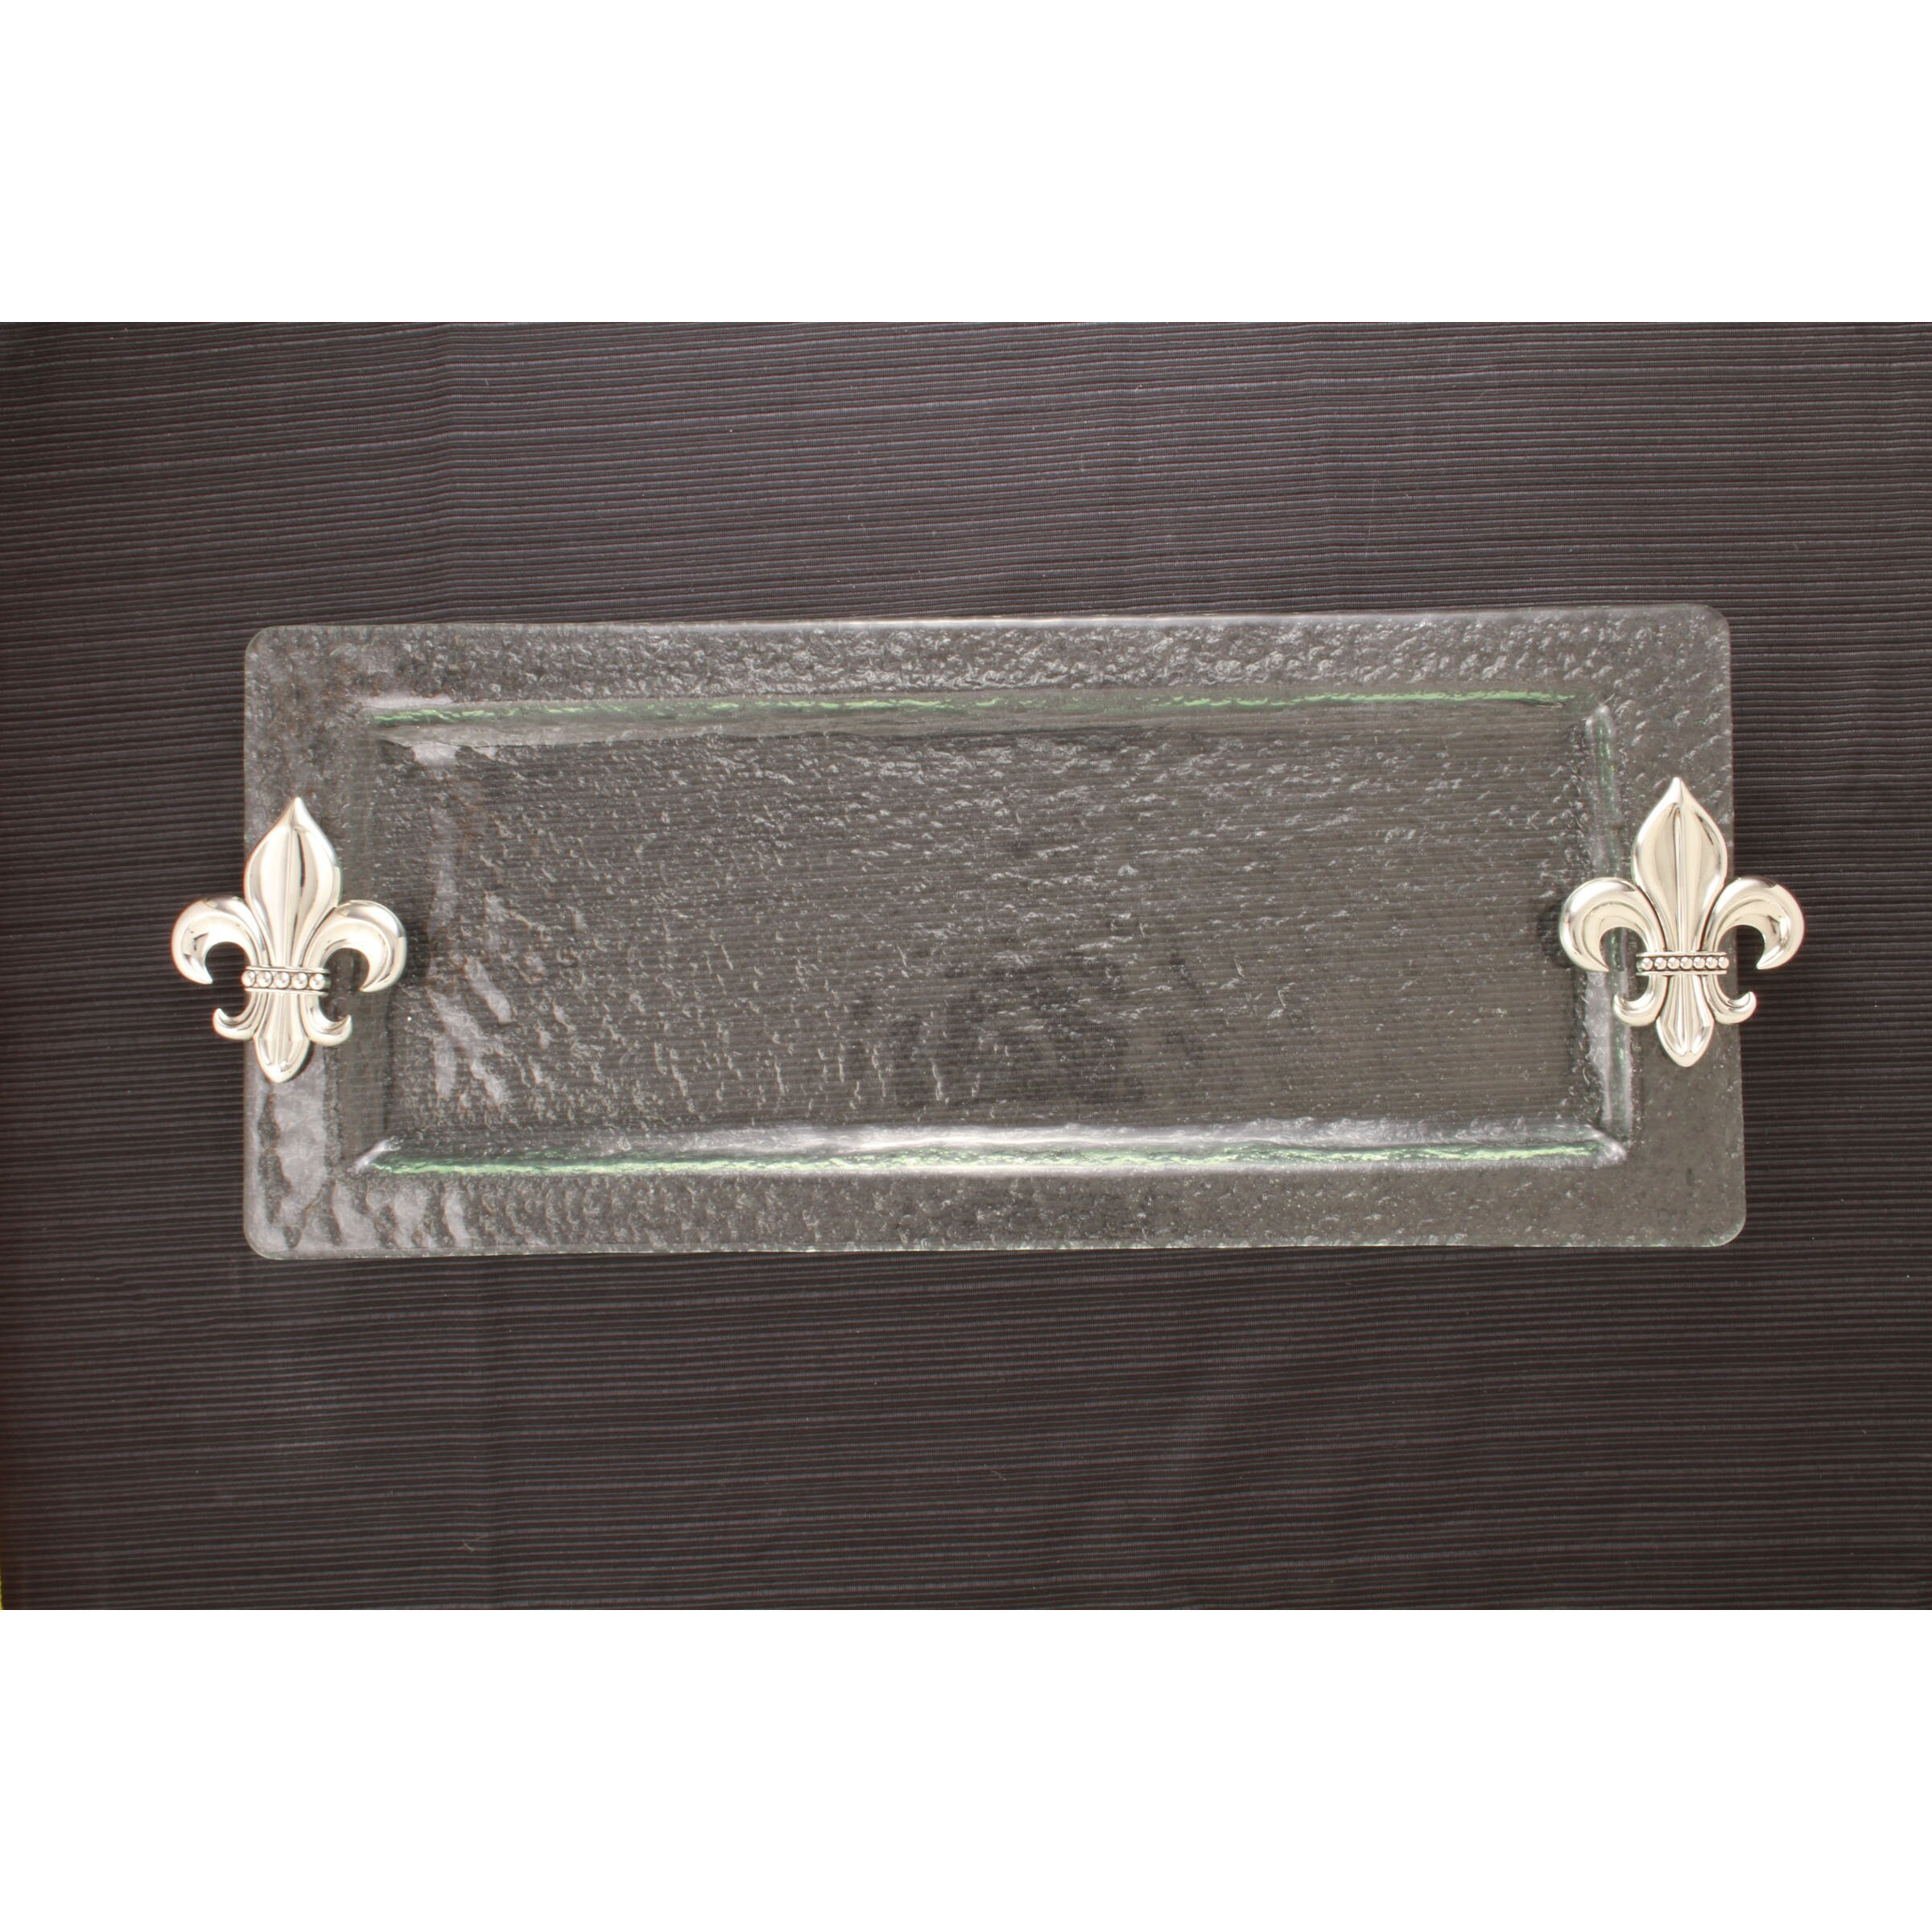 Thirstystone fleur de lis rectangular serving tray reviews wayfair - Fleur de lis serving tray ...